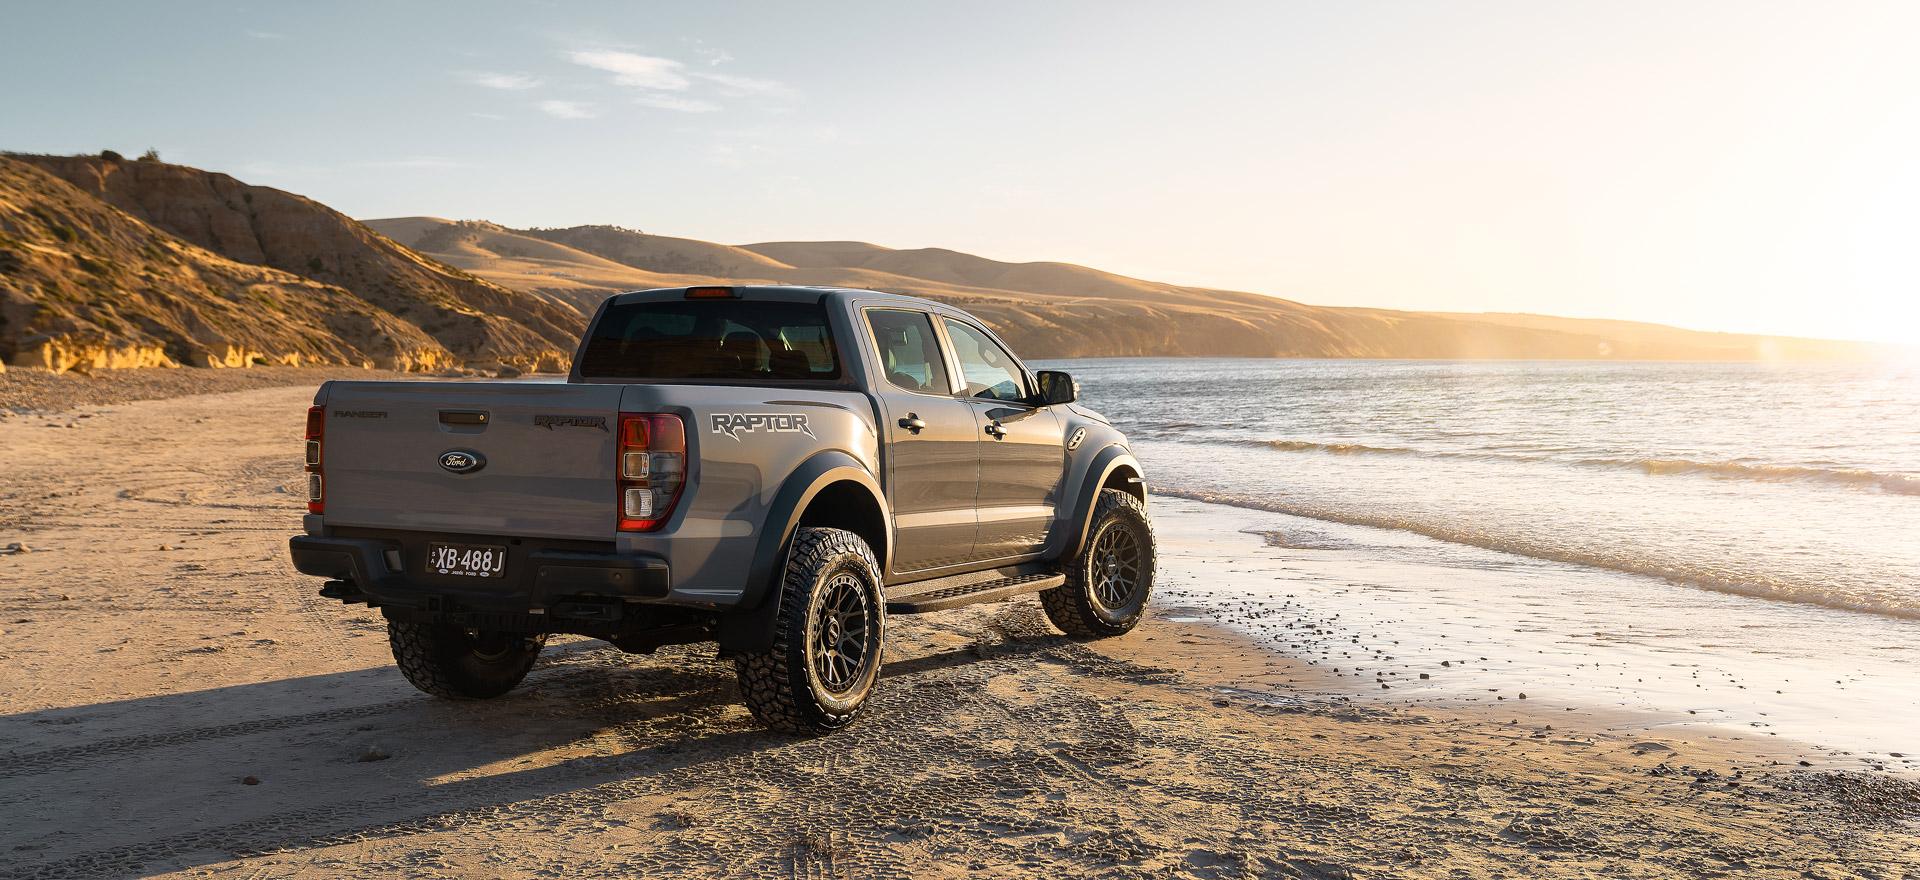 Crawler wheel on Ford Ranger Raptor feature beach sunset slide